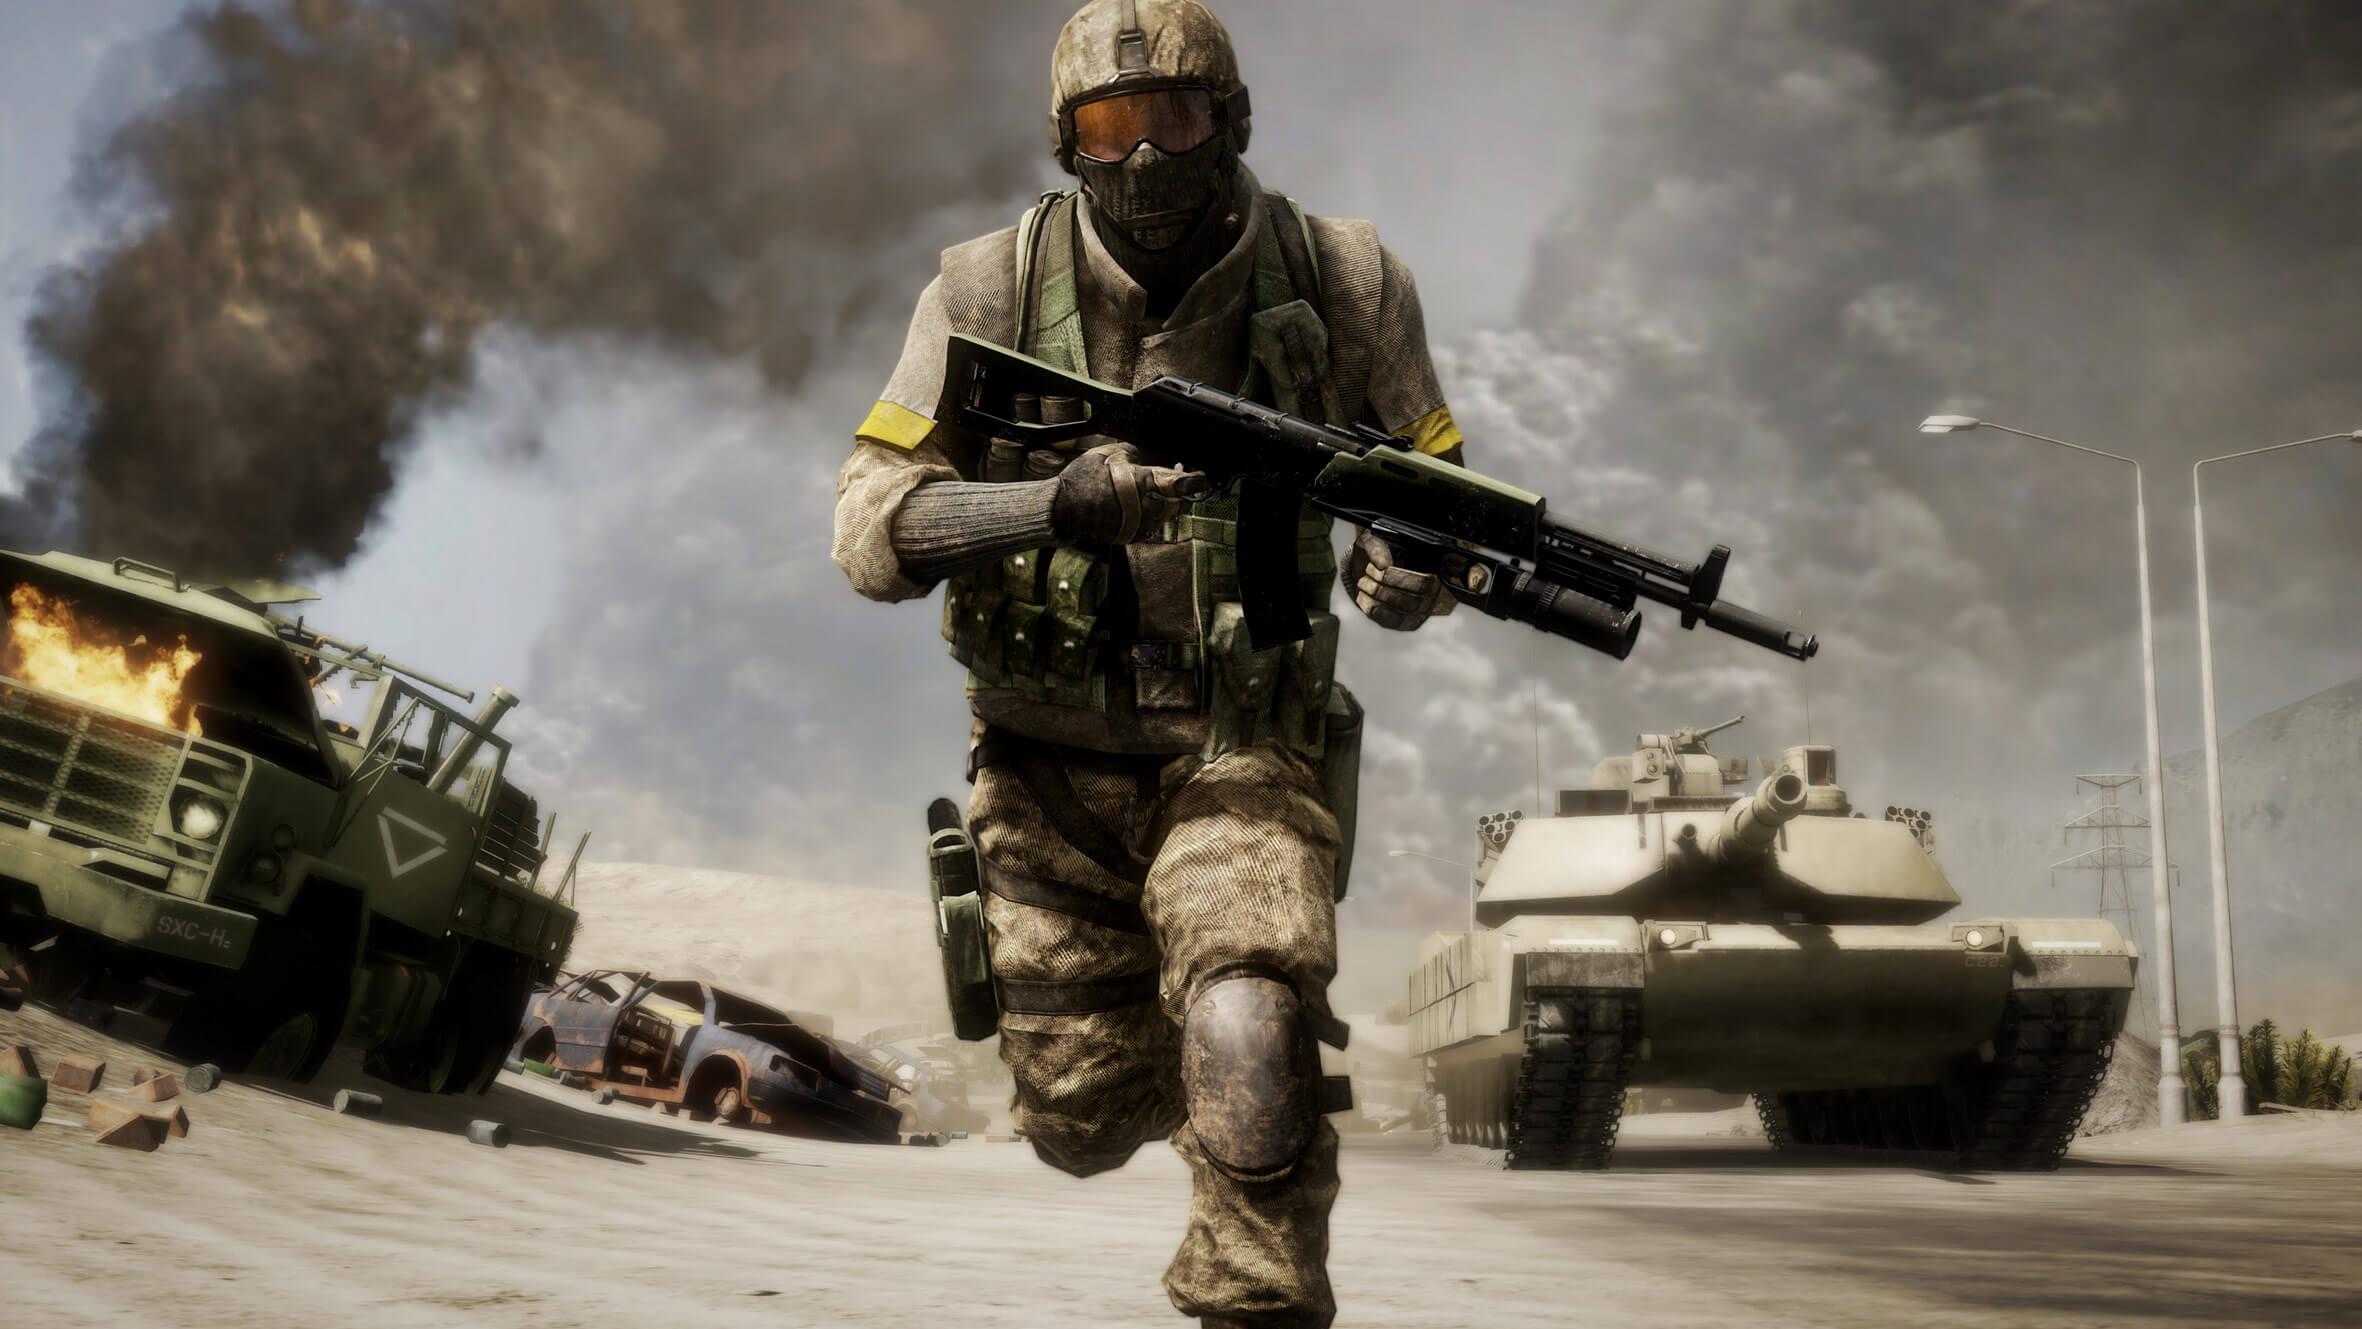 Battlefield serisi oyunları